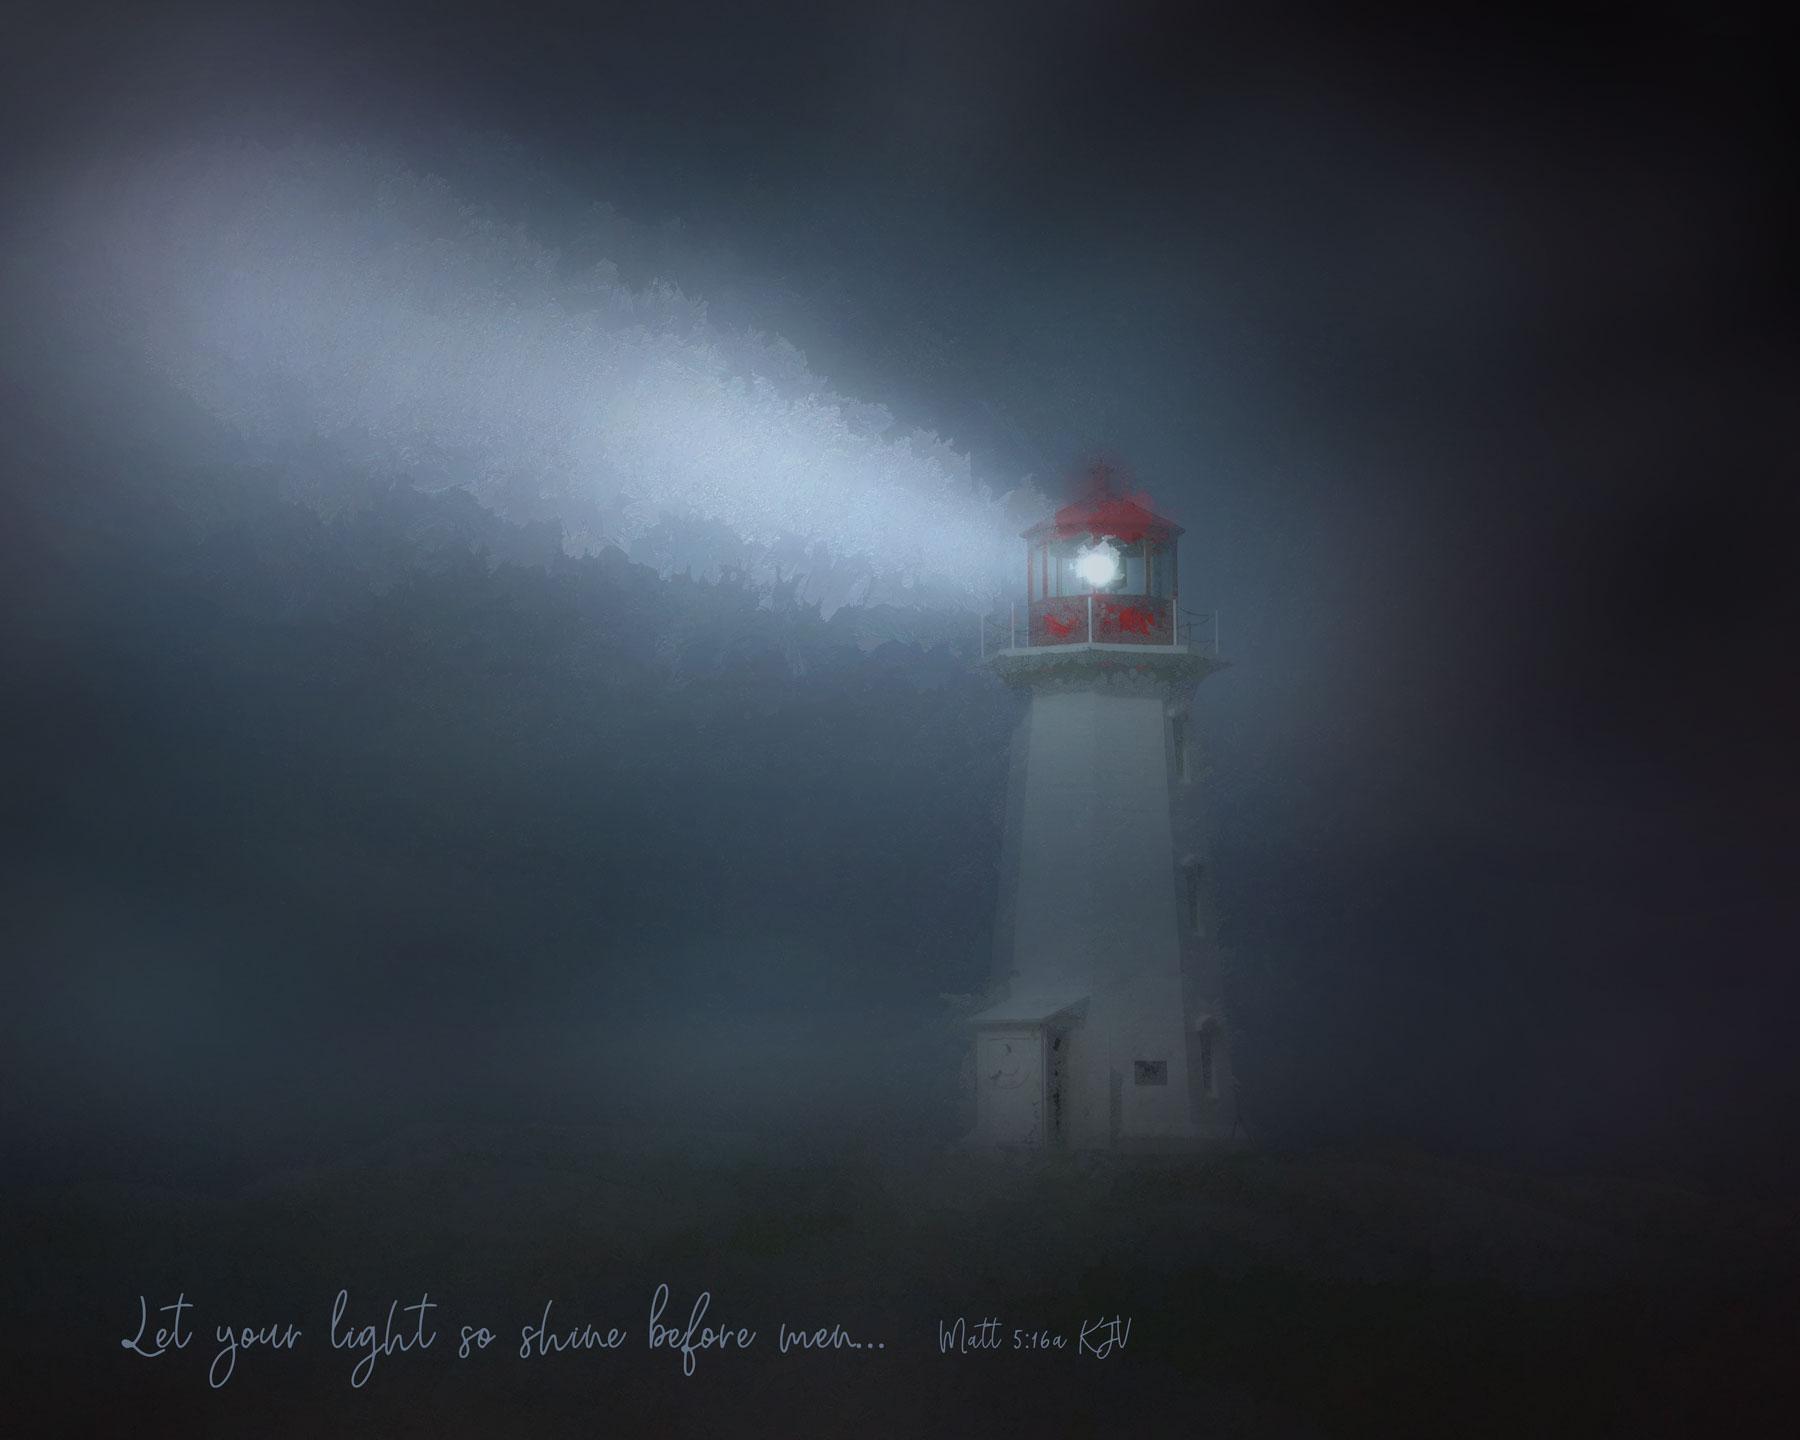 Let Your Light So Shine Before Men